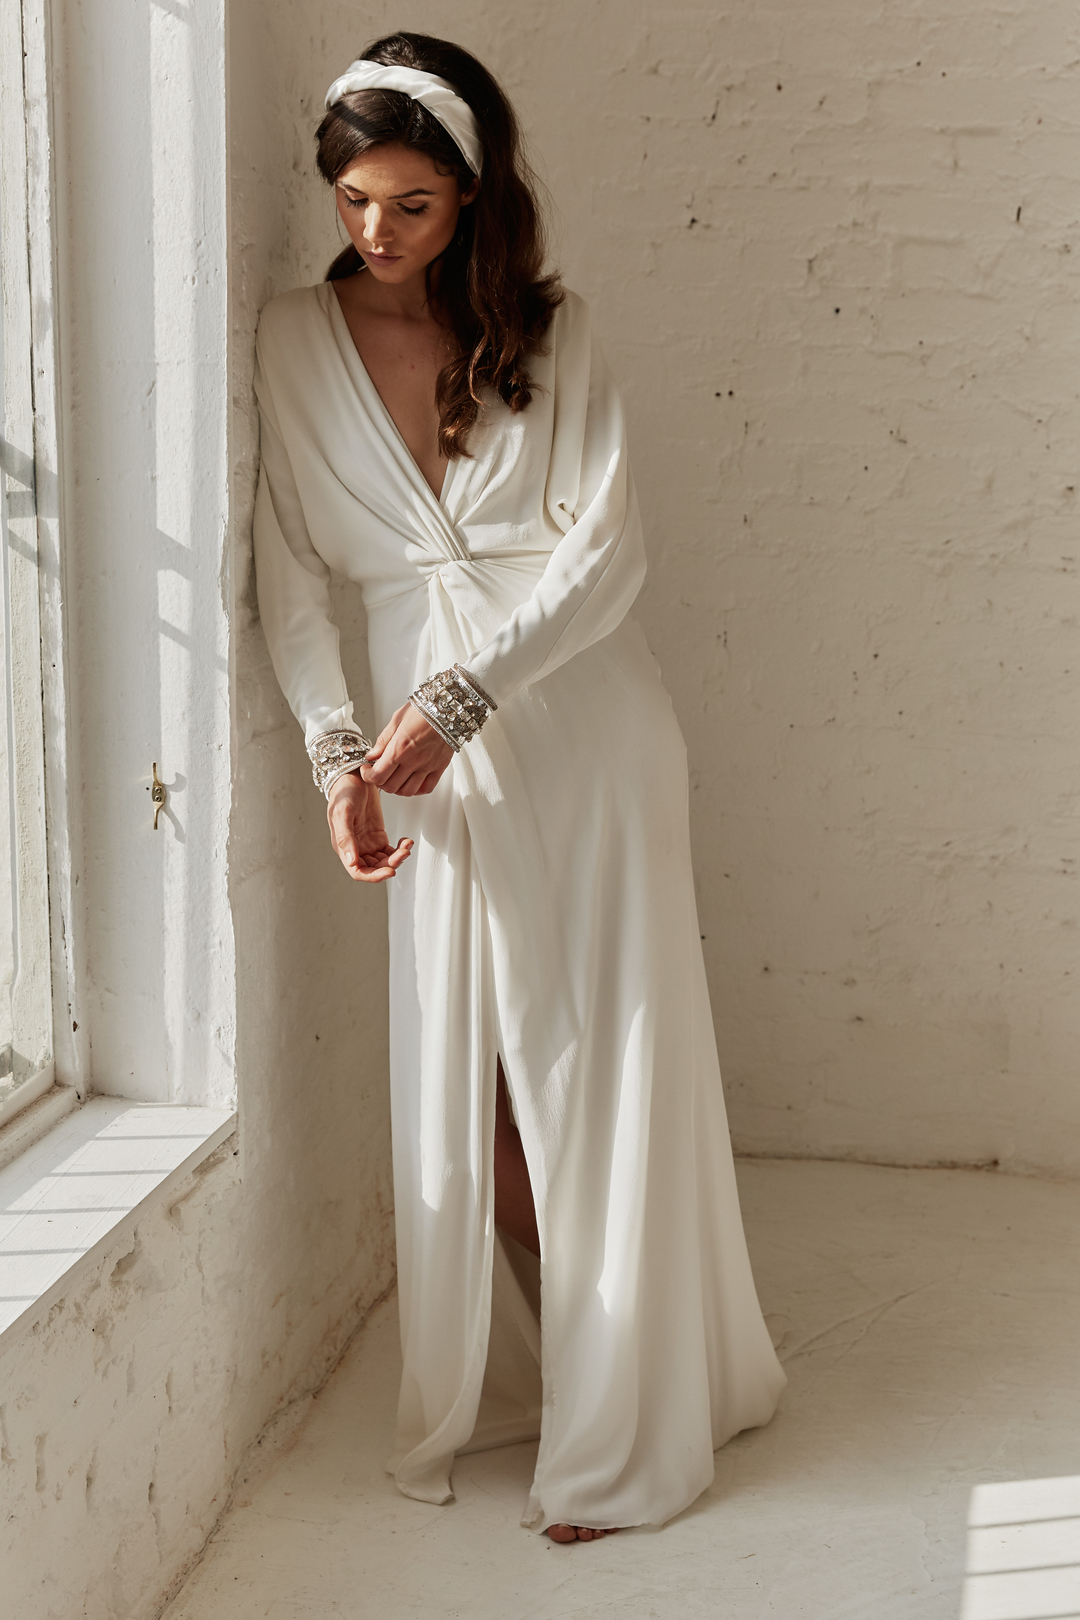 mae gown dress photo